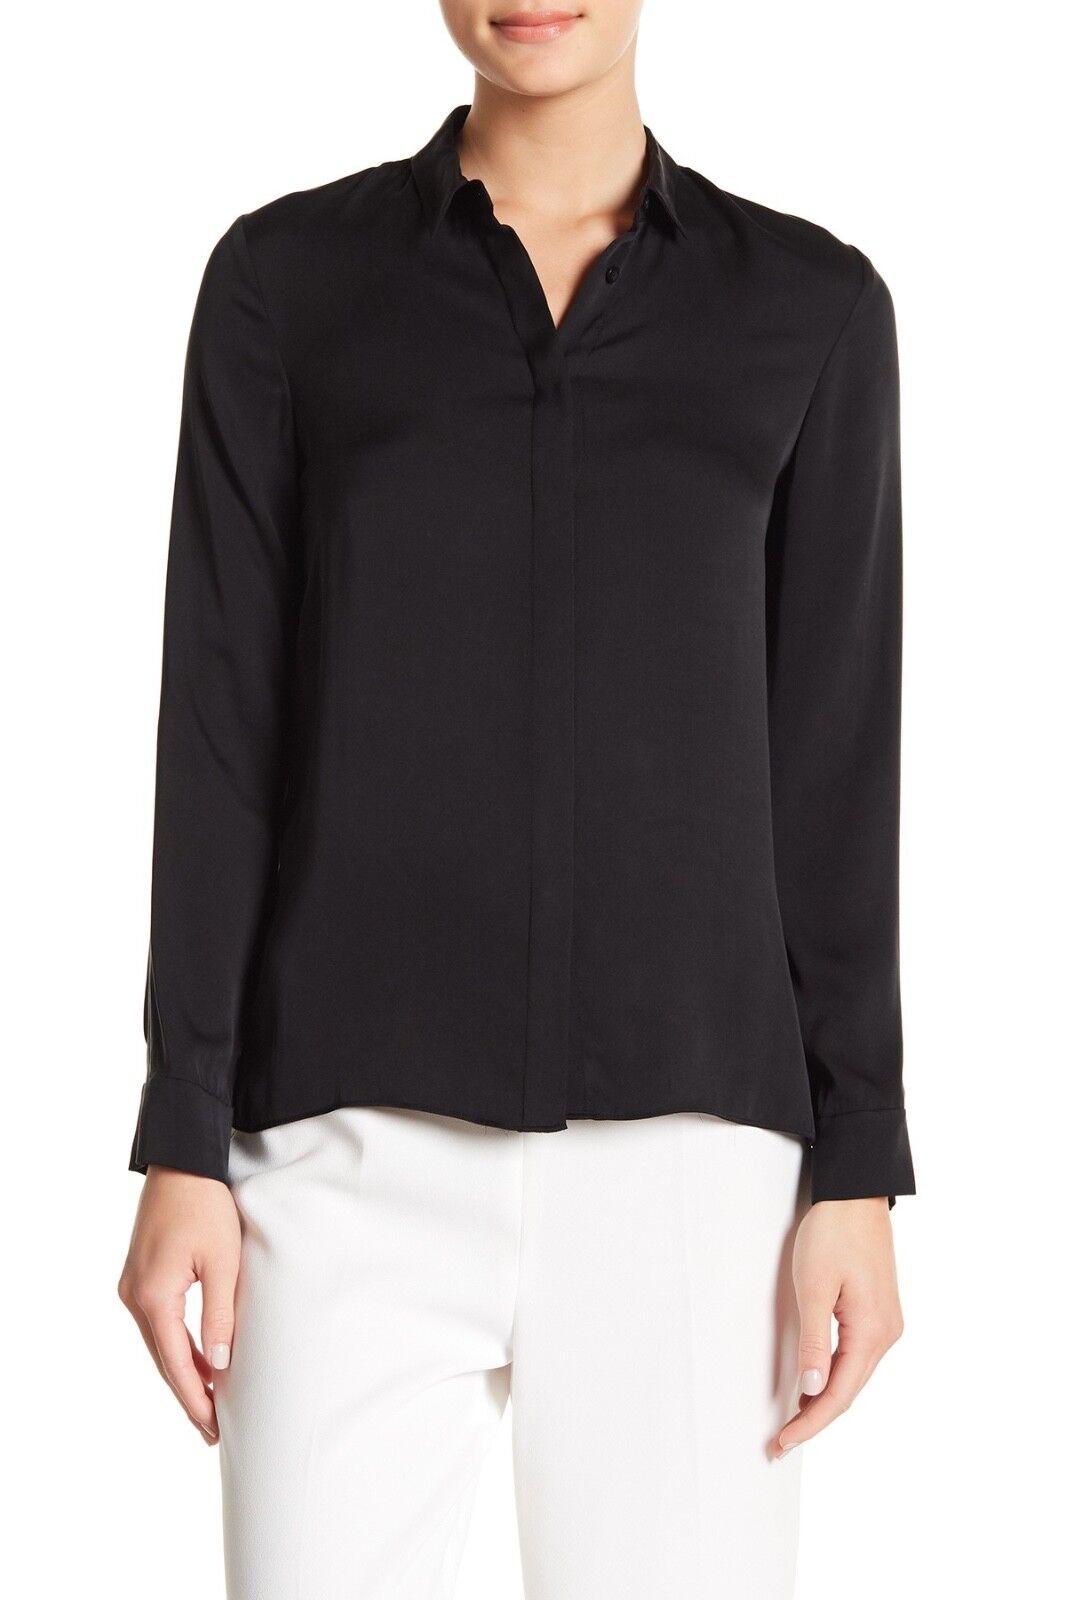 NWT  Alice + Olivia  Willa  Small Collar Placket Top in schwarz - Größe XS